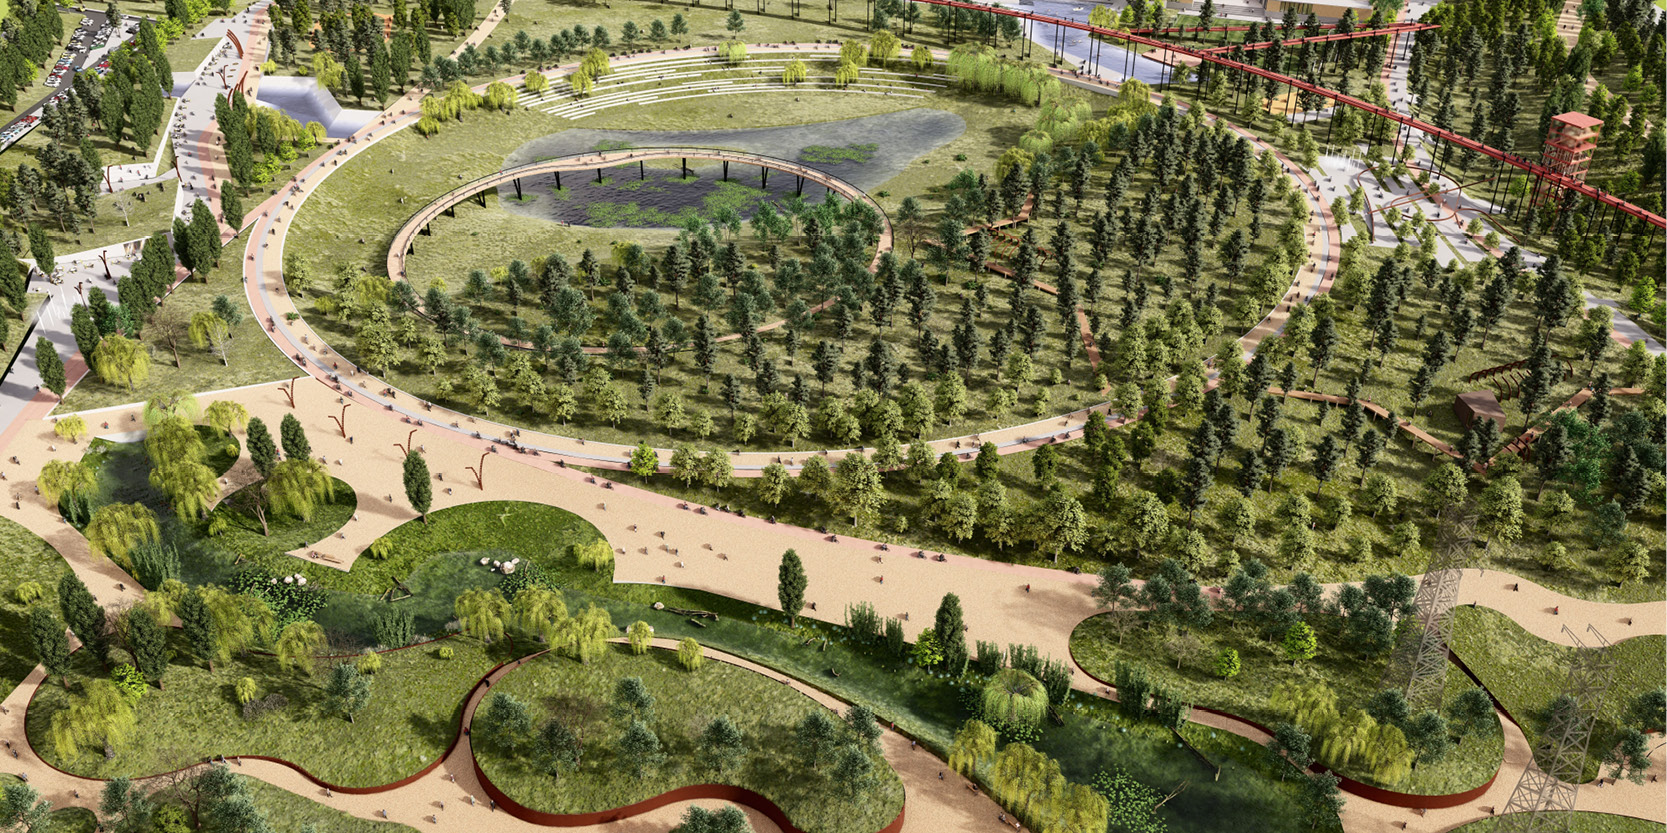 OCA architects Coziness Valley Долина Уюта competition Murmansk region Hernan Lleida Ruiz Bernardo Garcia Morales Miquel Perez Eric Moya3